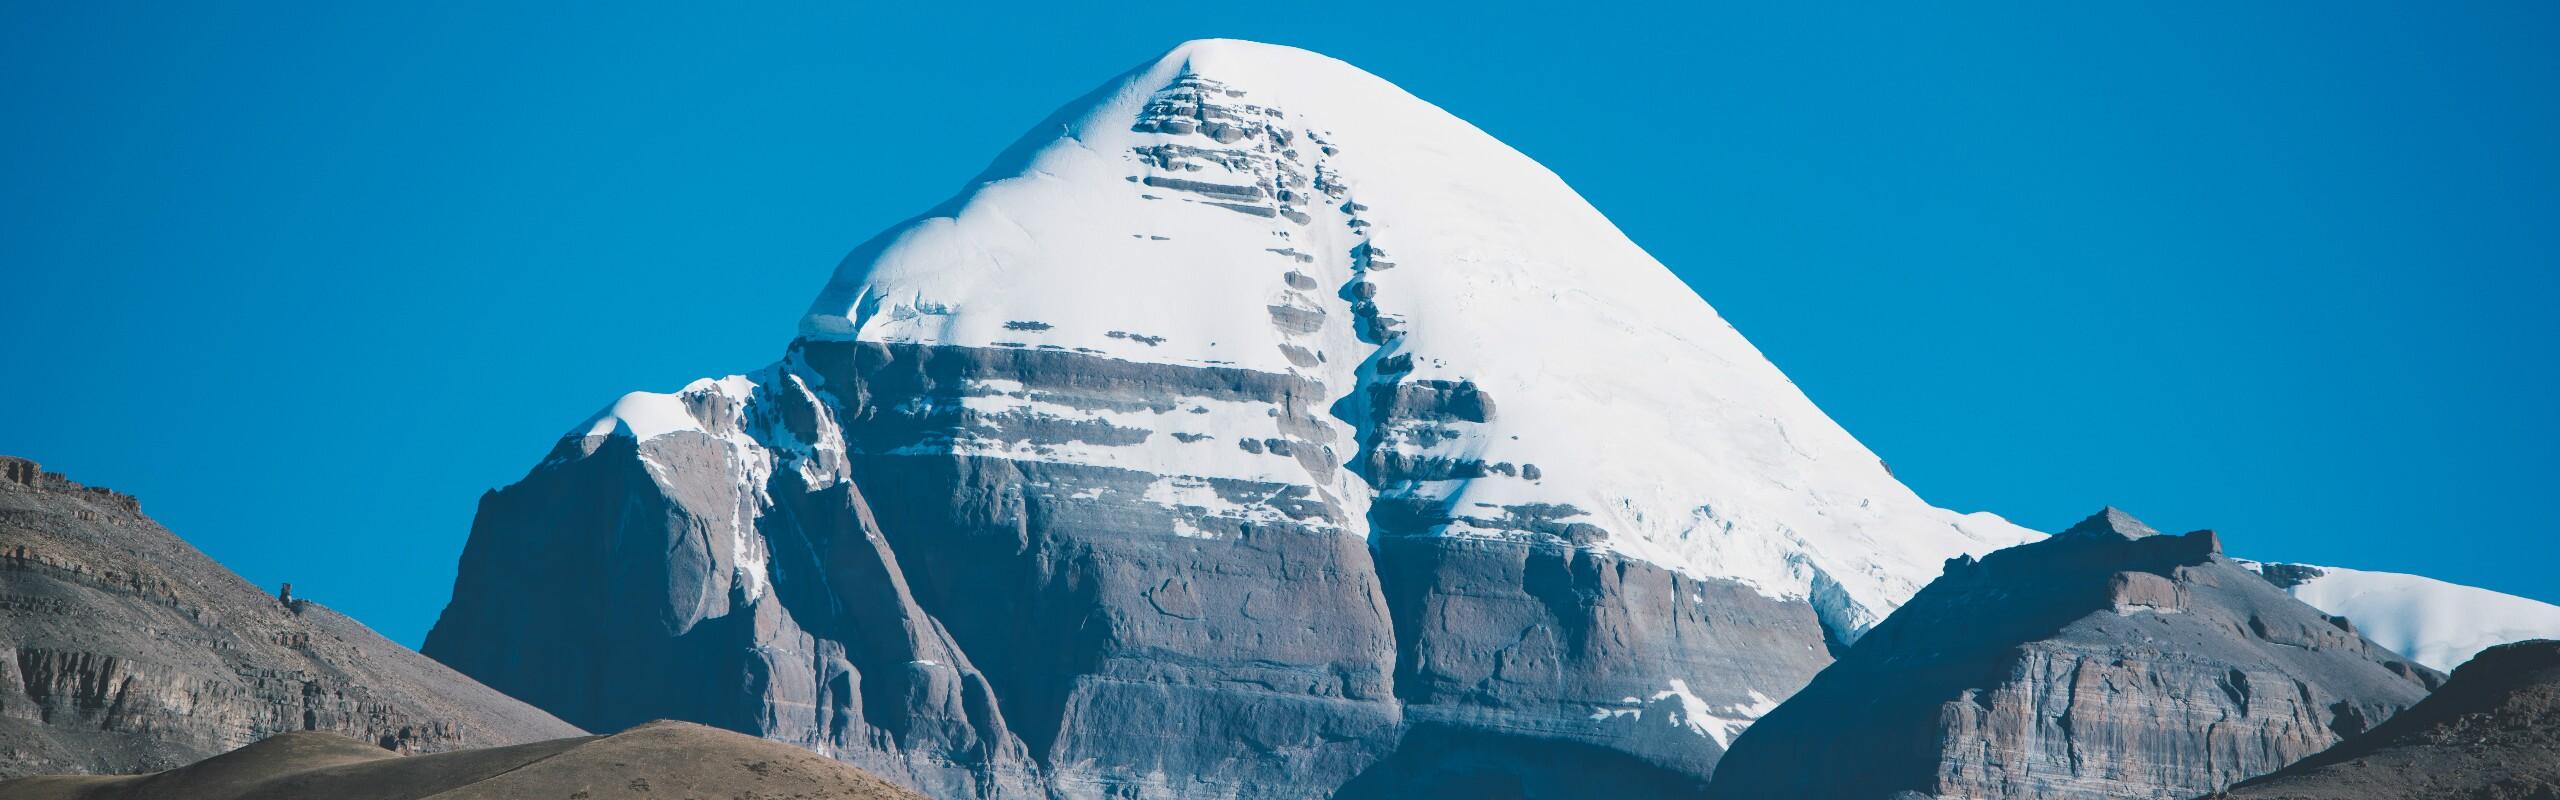 14-Day Tibet Tour with Mt. Kailash and Lake Manasarovar